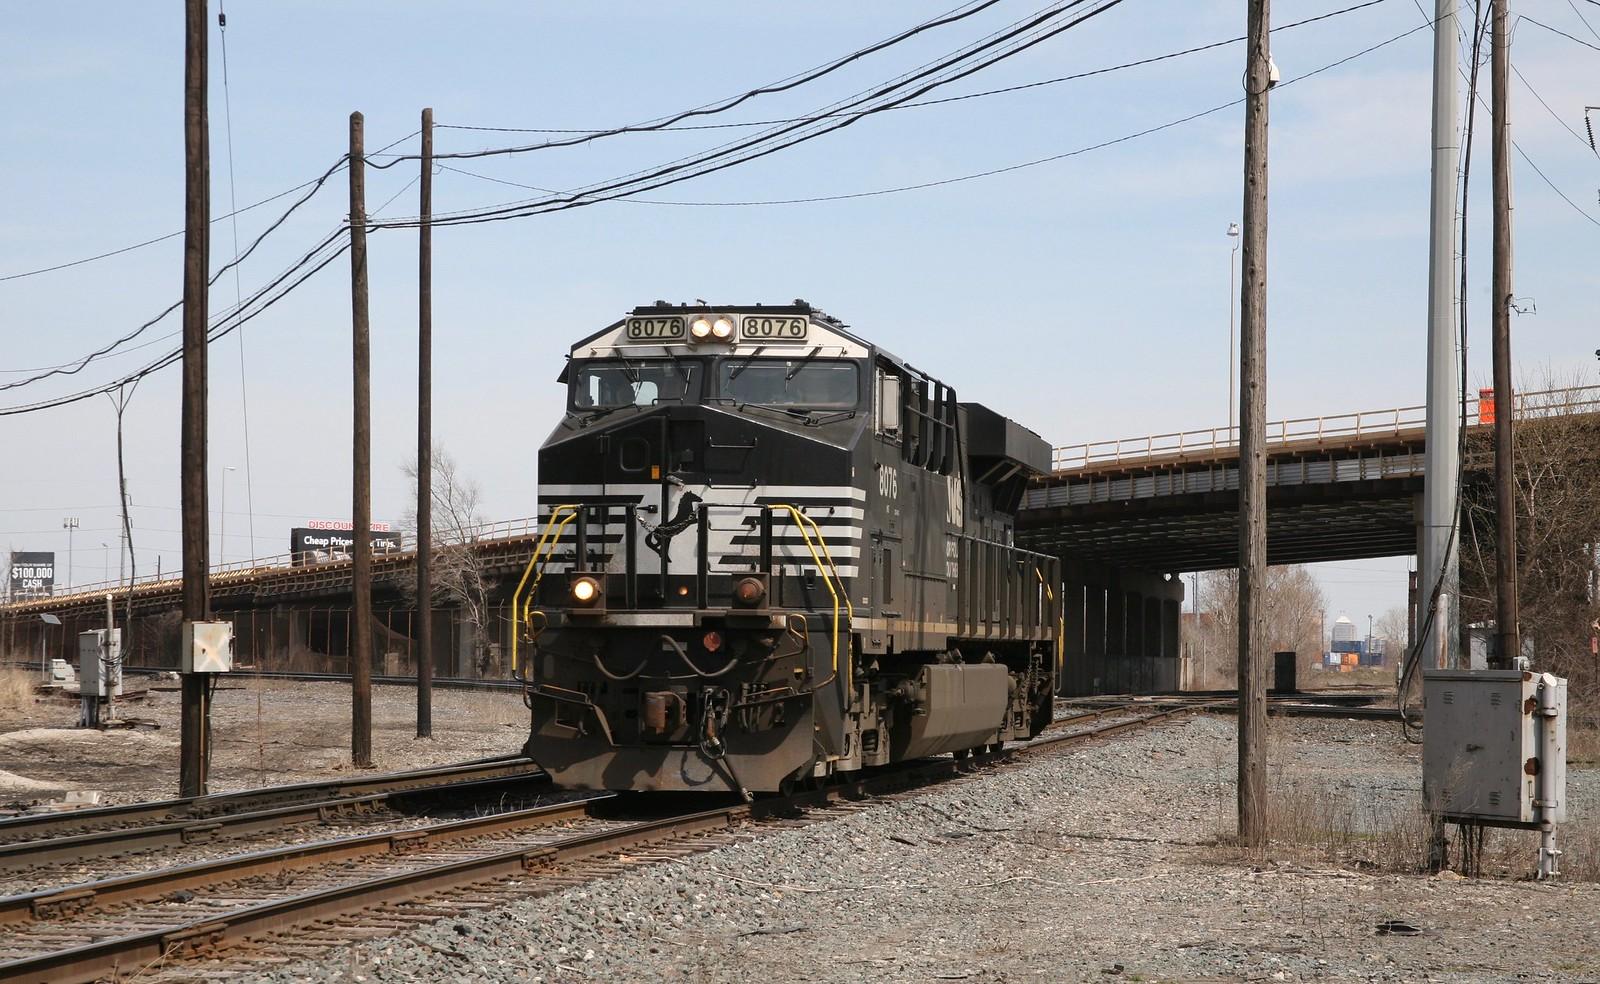 Detroit Railfanning - Page 21 - Model Train Journal